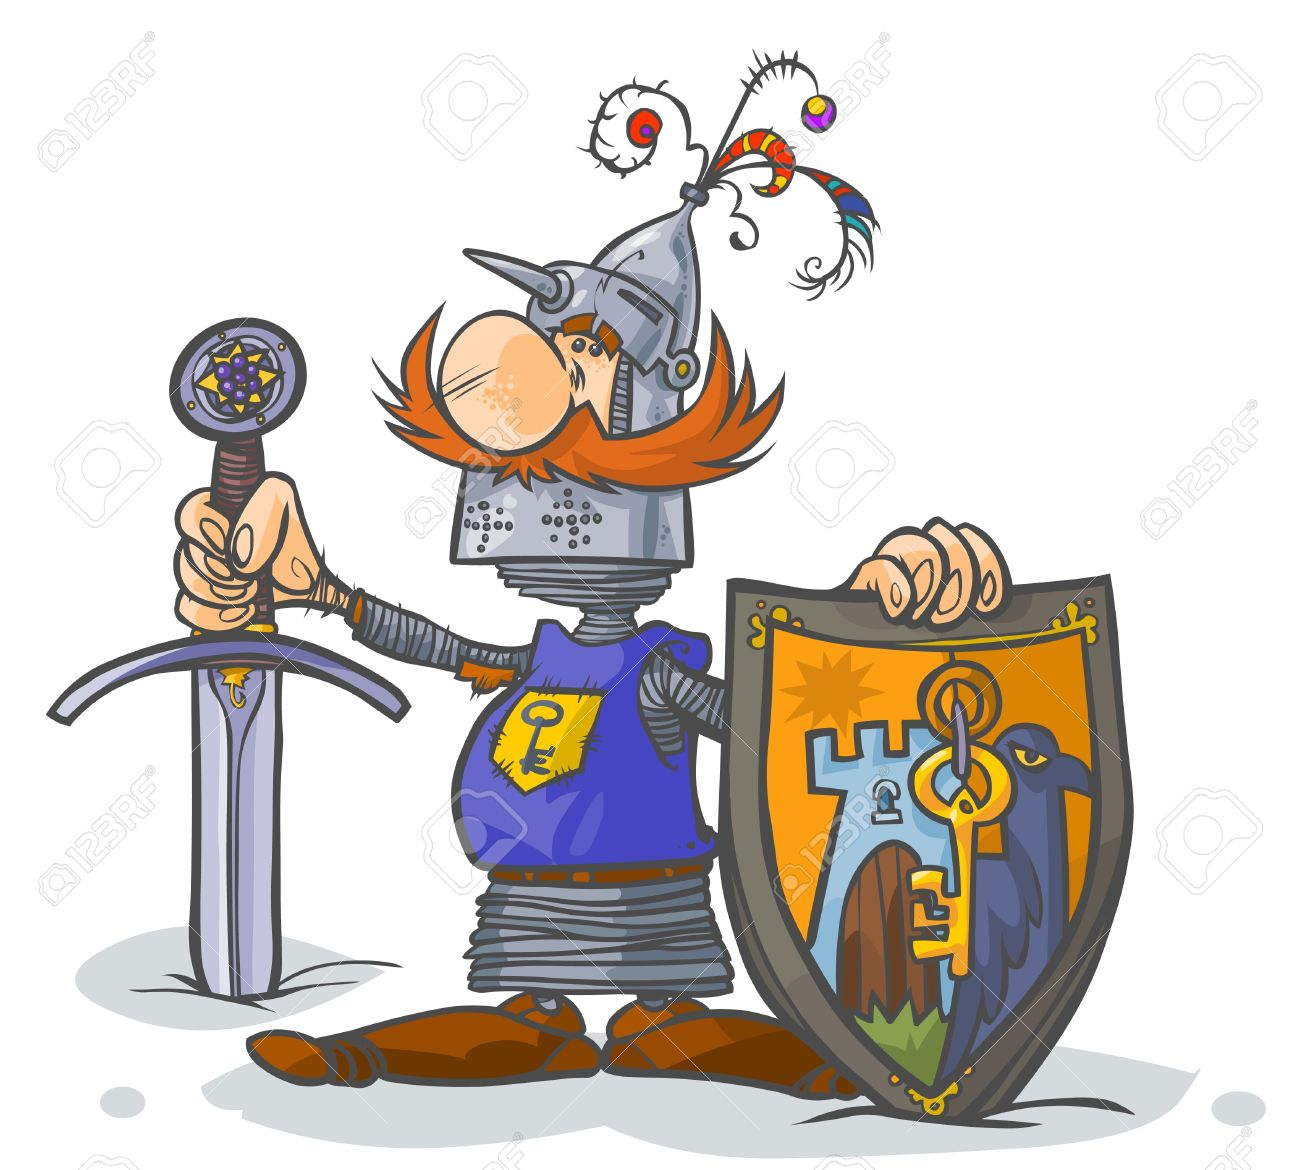 Cartoon Knight Royalty Free Cliparts, Vectors, And Stock.